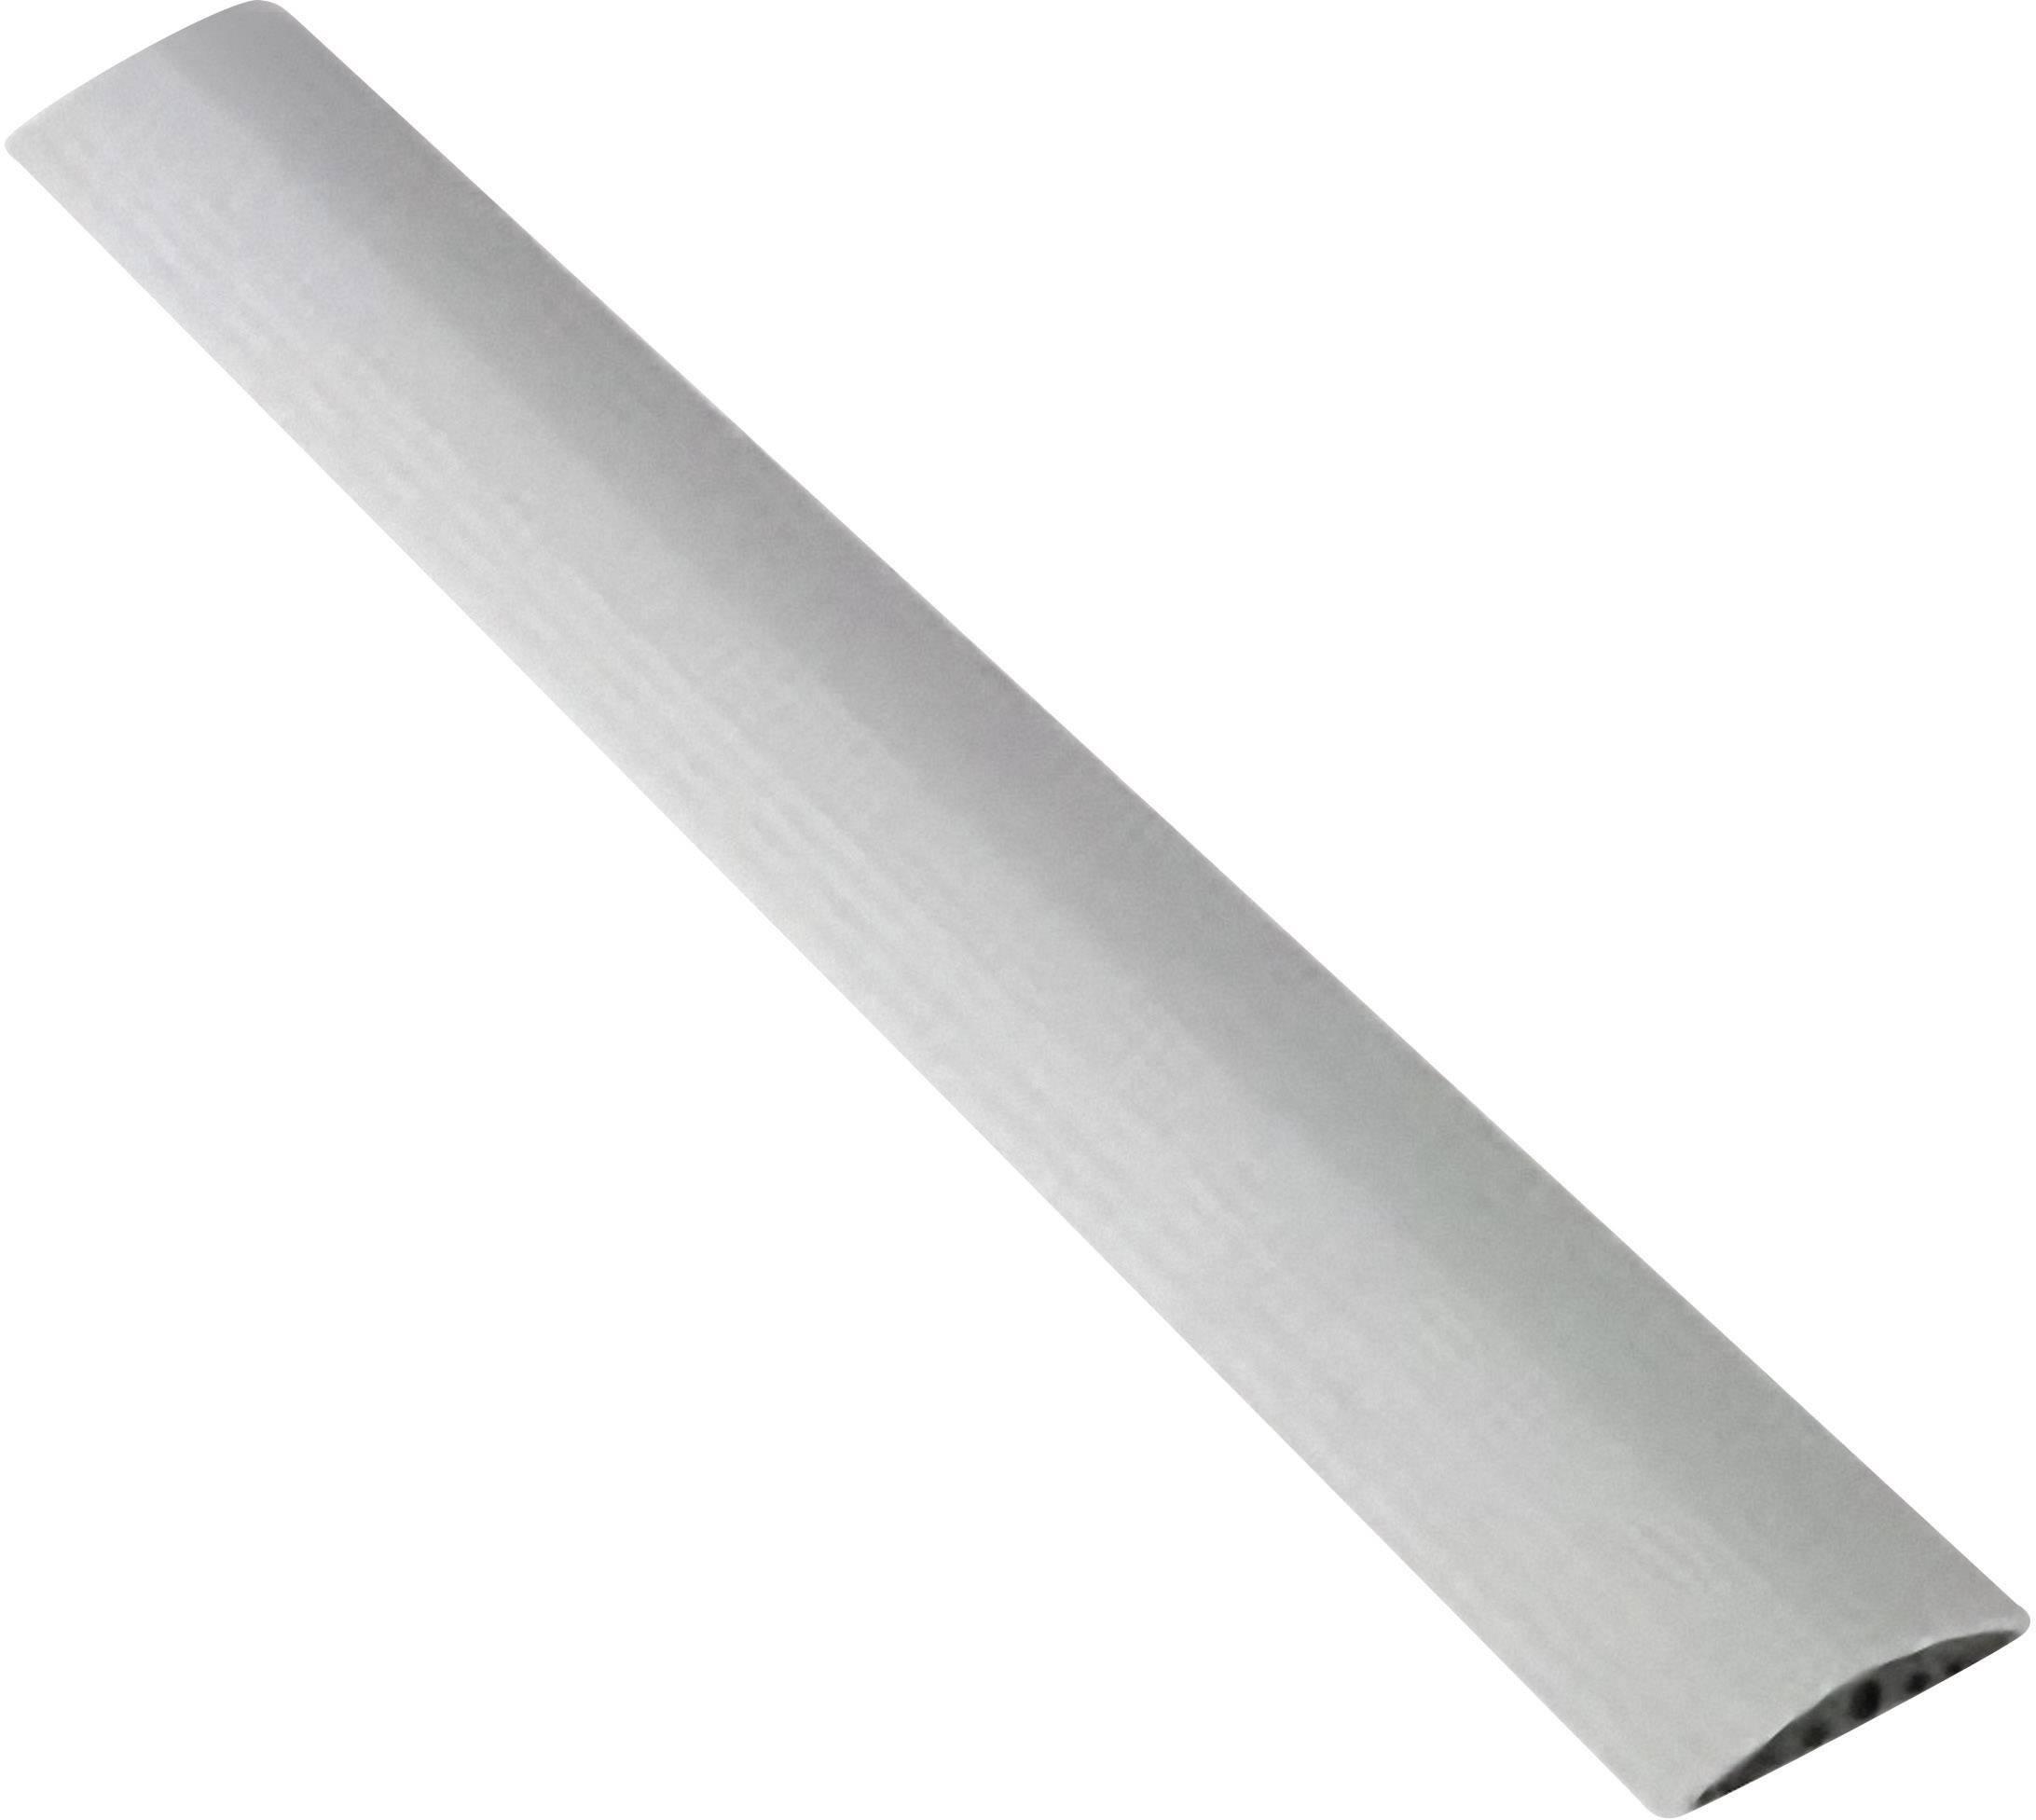 Káblový mostík Serpa 5.01021.7042 B15, (d x š) 1500 mm x 150 mm, svetlosivá, 1 ks